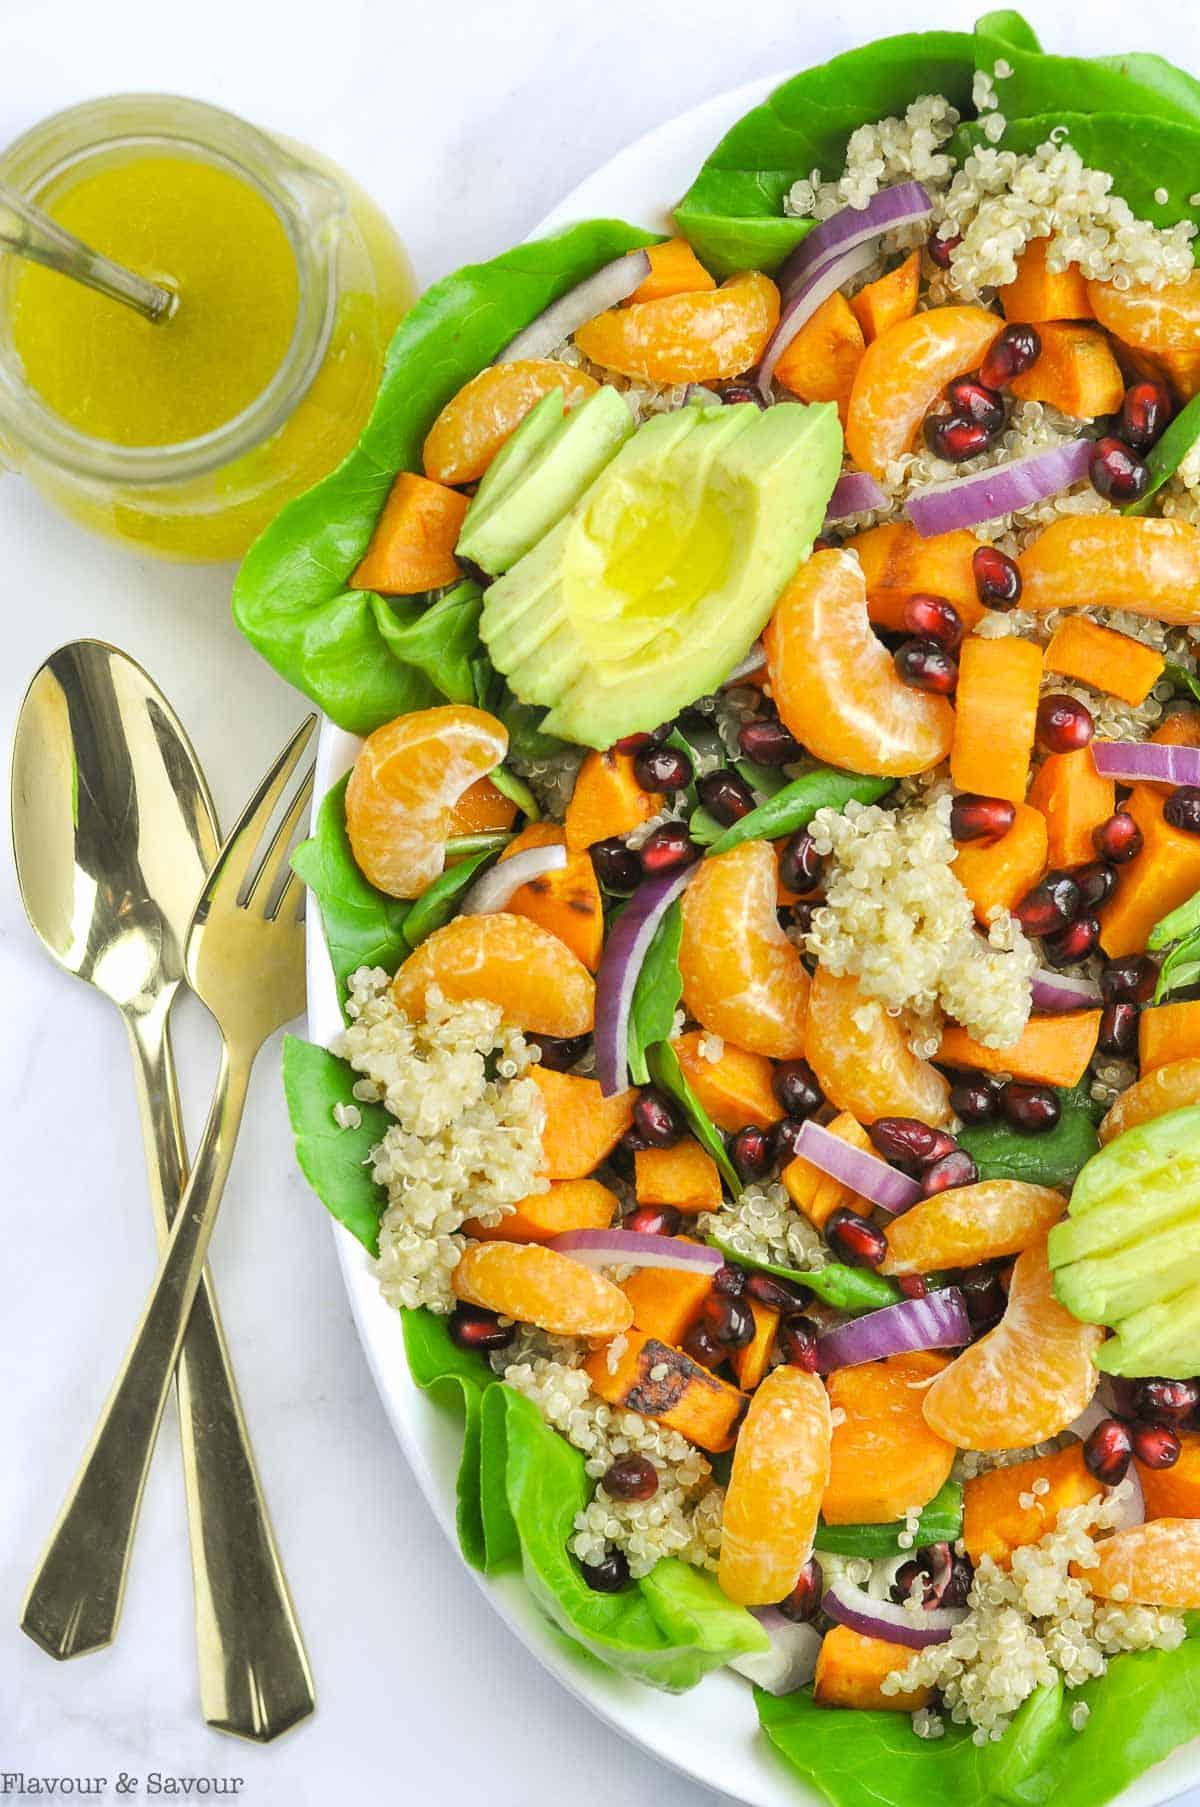 Sweet Potato Quinoa Salad with dressing and utensils